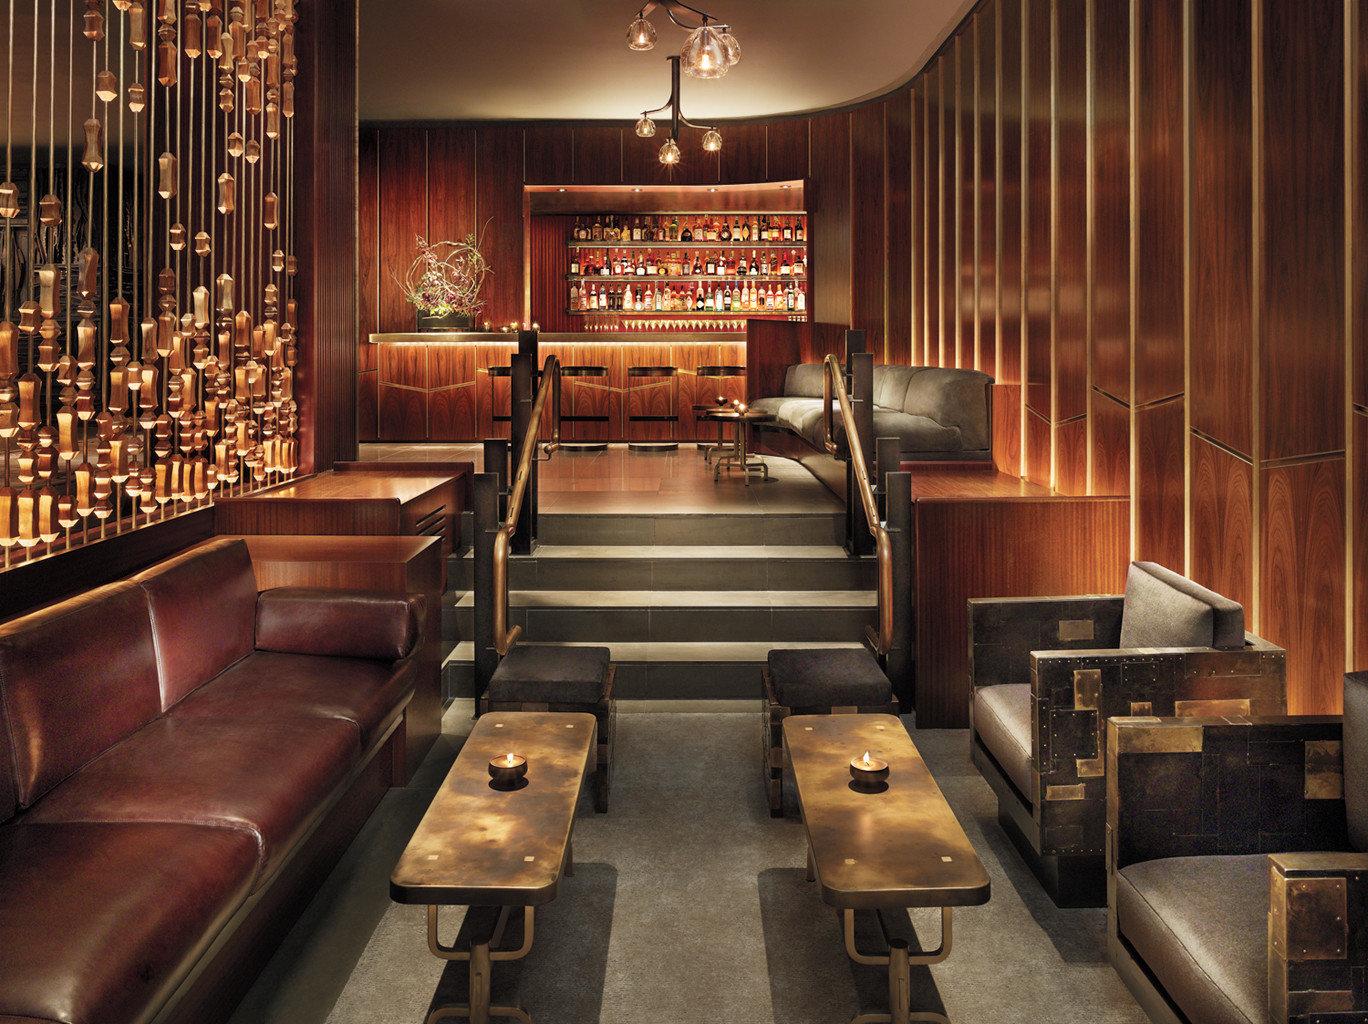 Bar Boutique City Drink Hotels Lounge Luxury Trip Ideas Lobby auditorium restaurant leather pew